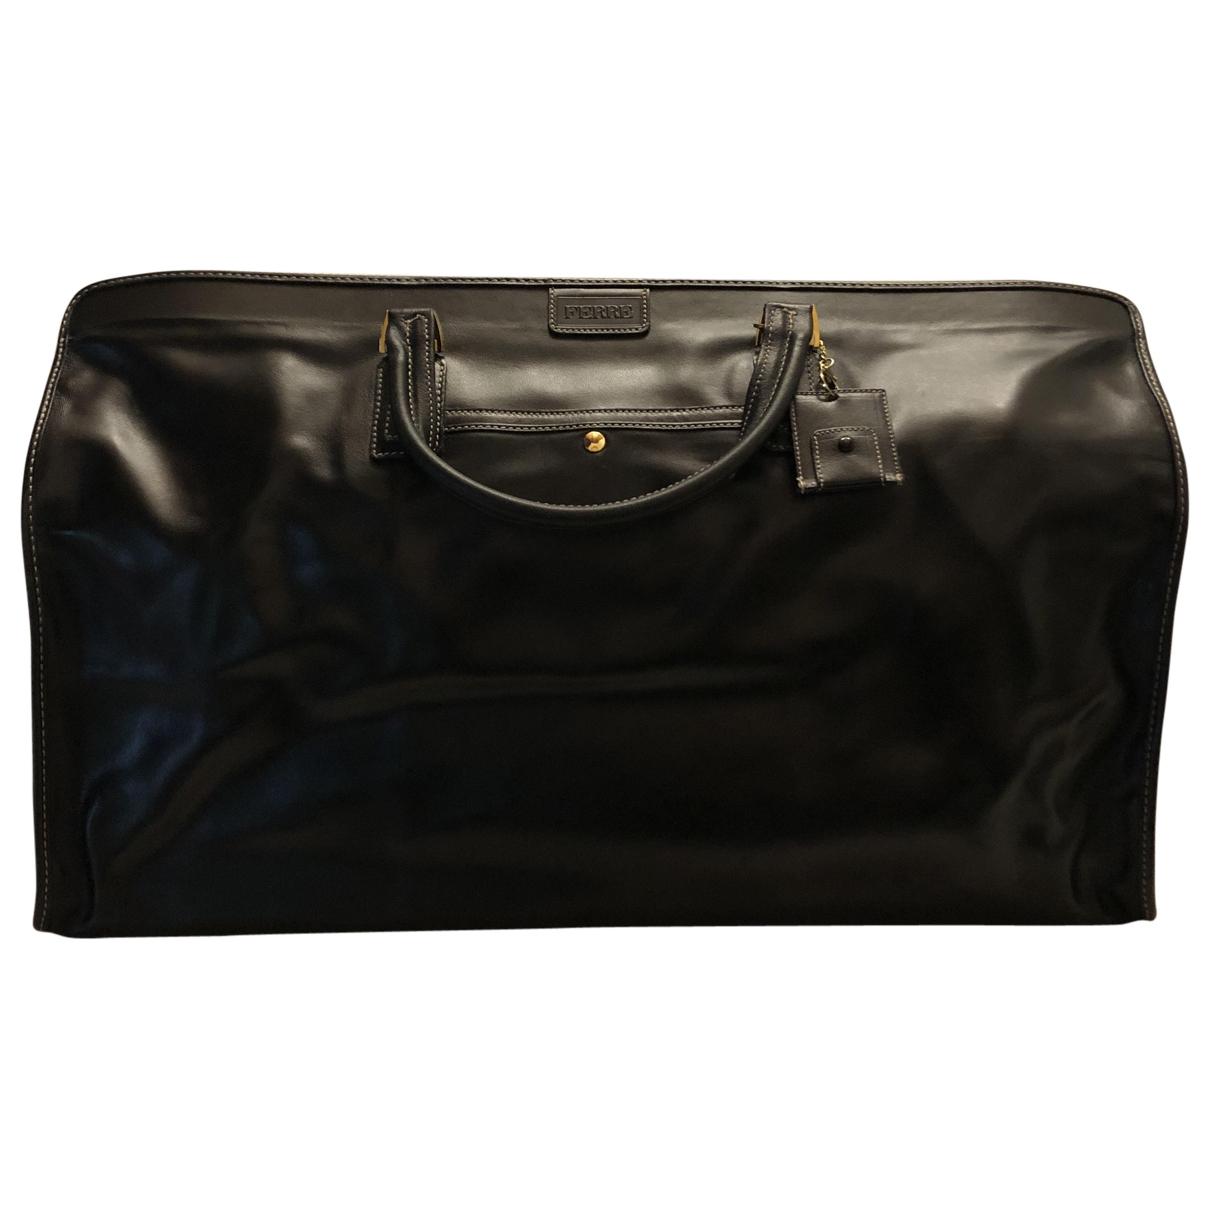 Gianfranco Ferré \N Black Leather bag for Men \N